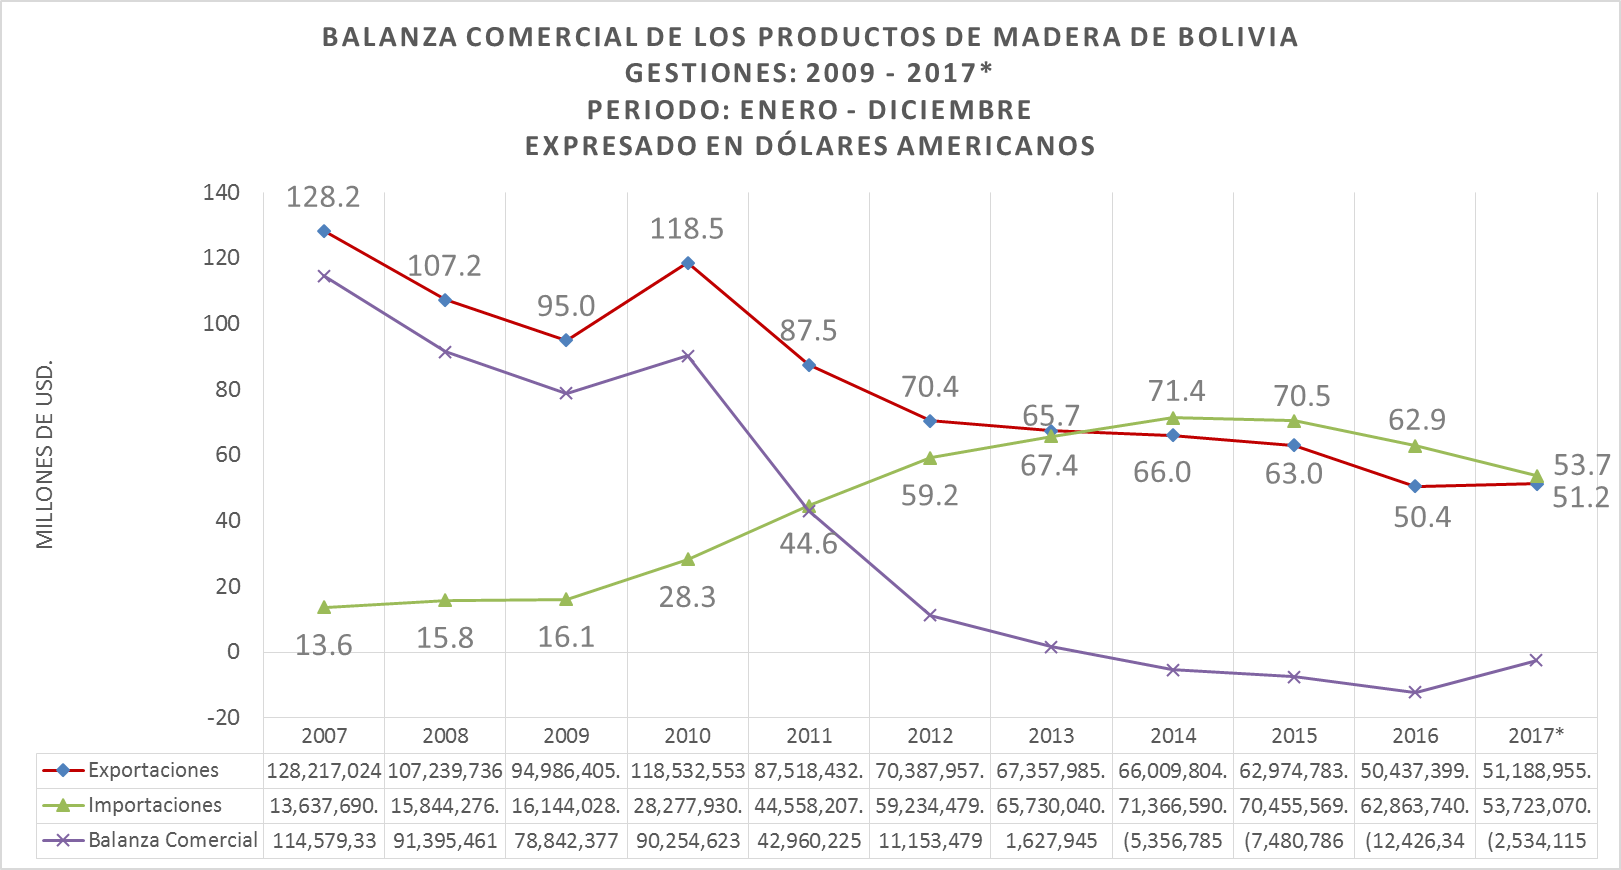 Balanza Comercial de Productos de Madera de Bolivia, Exportaciones e importaciones de productos de madera 2017